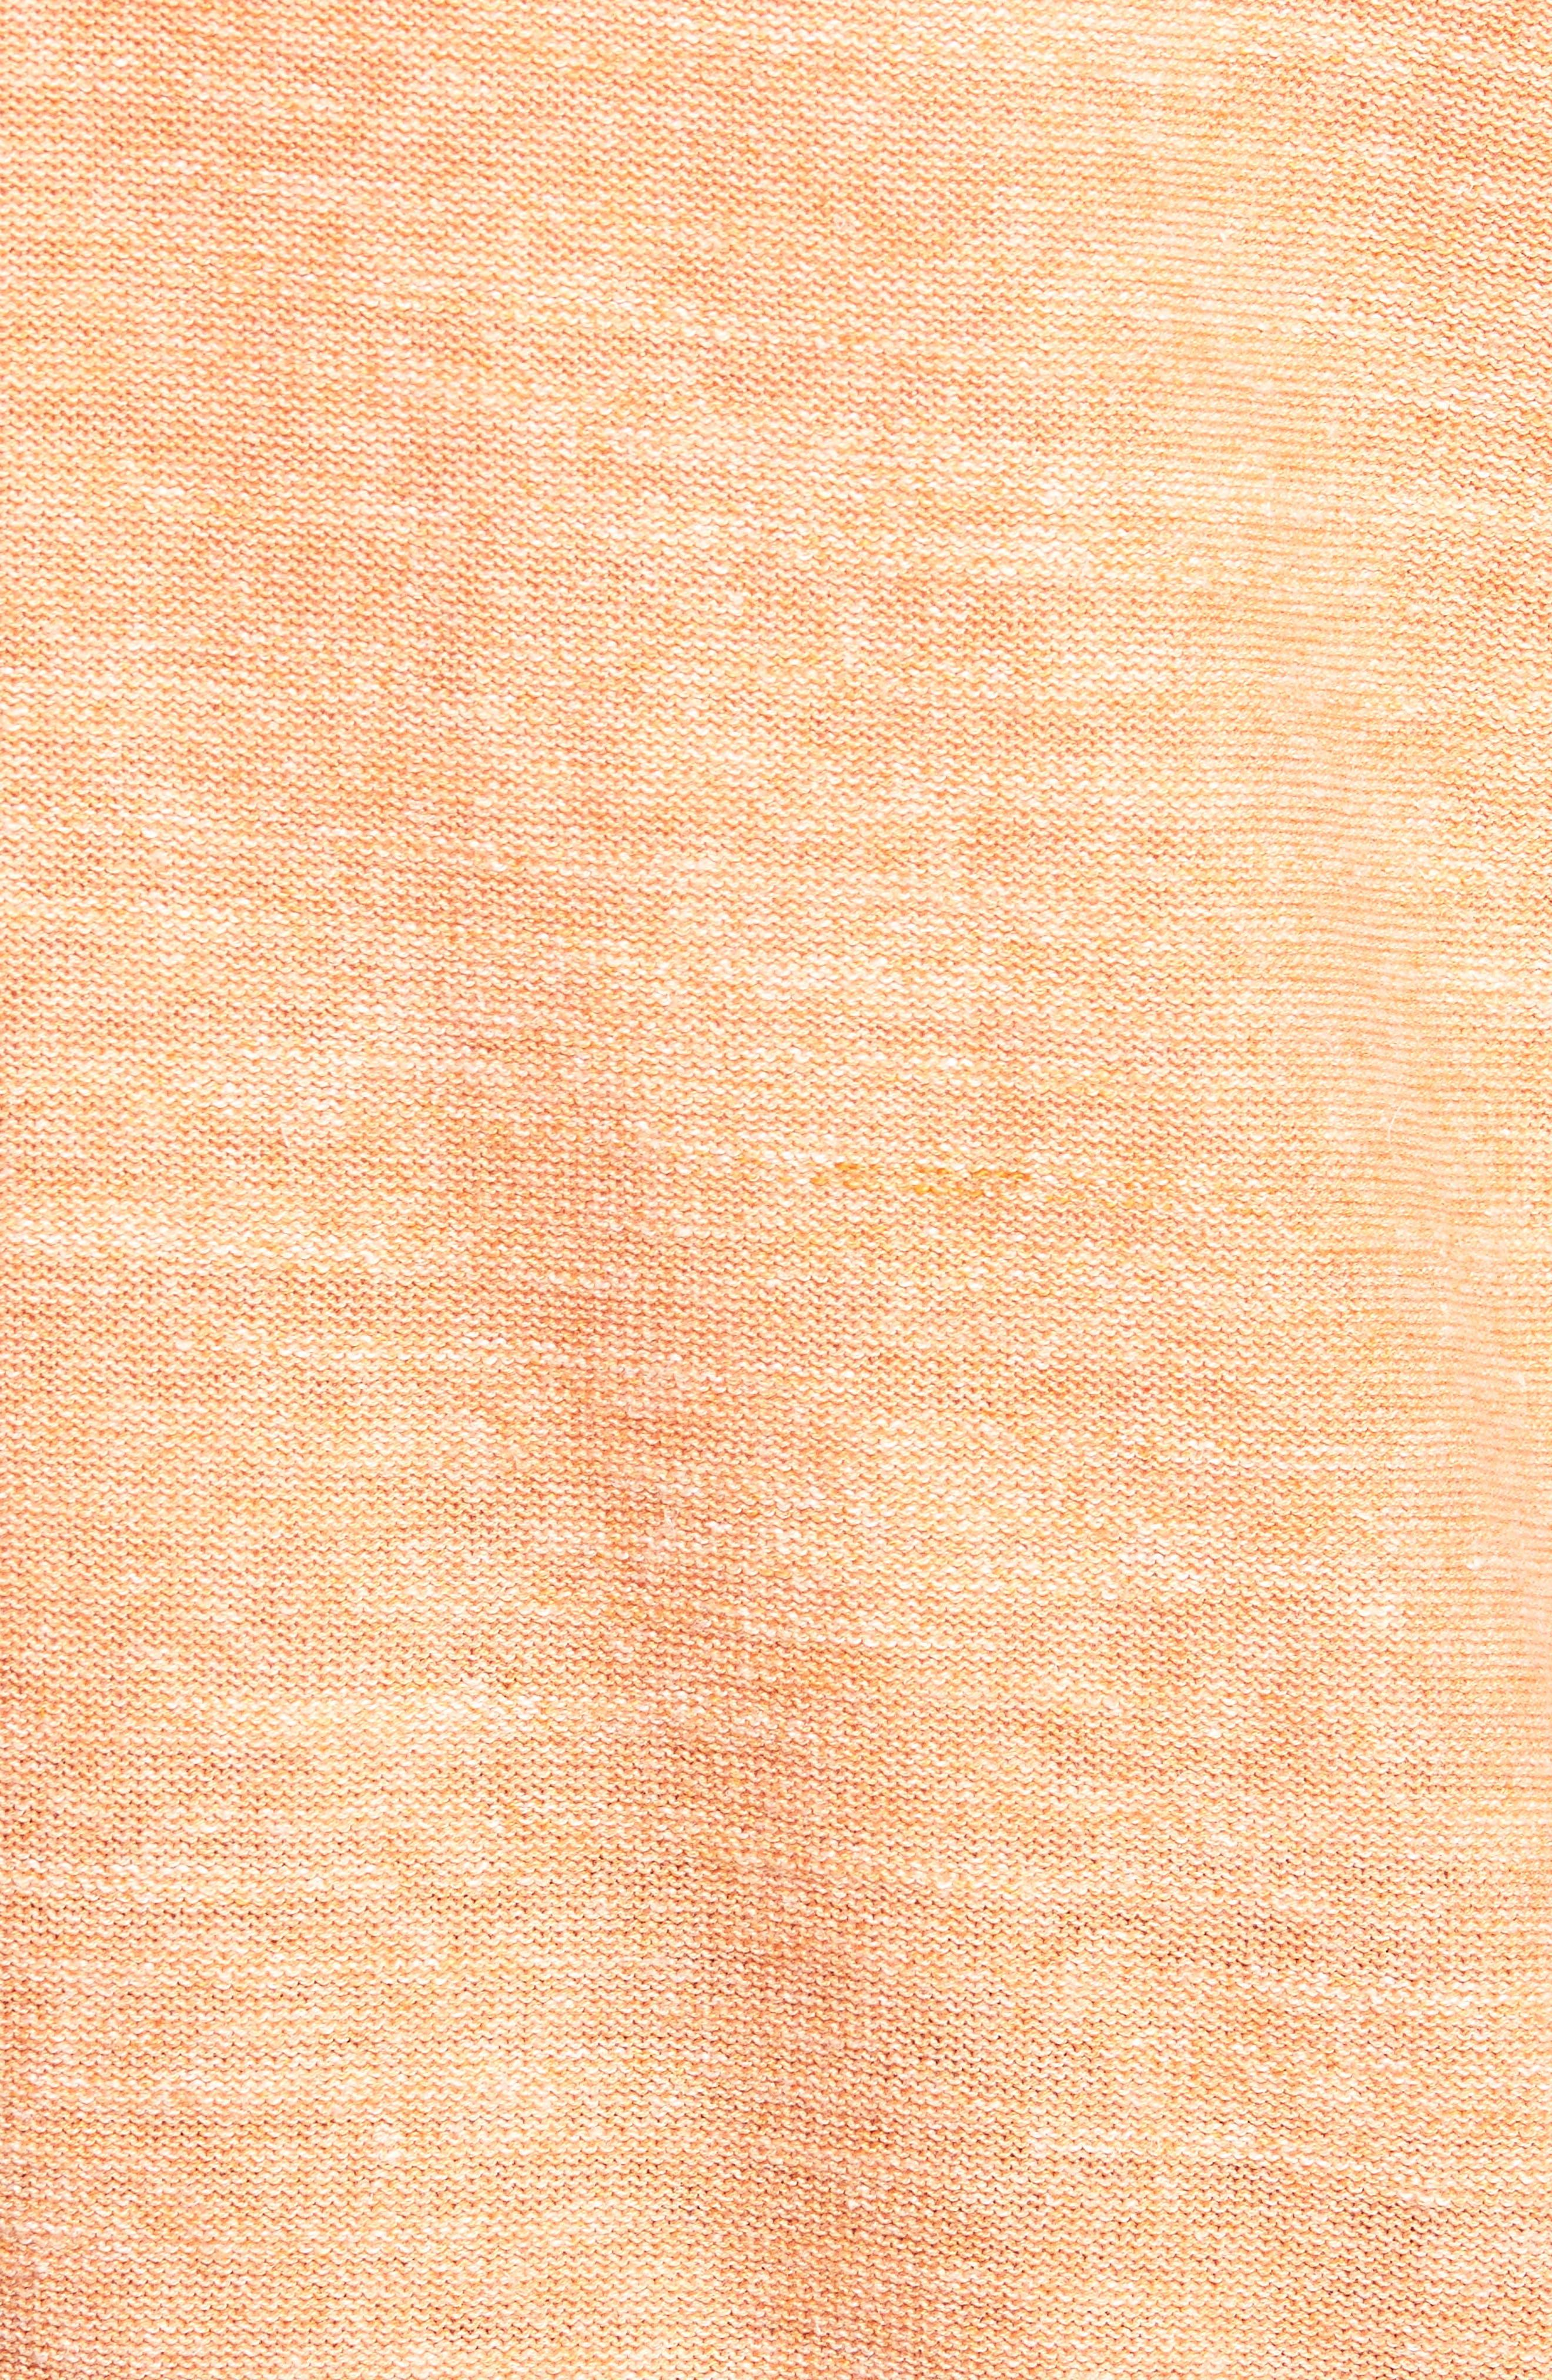 Sandy Bay Half-Zip Pullover,                             Alternate thumbnail 5, color,                             Curuba Heather